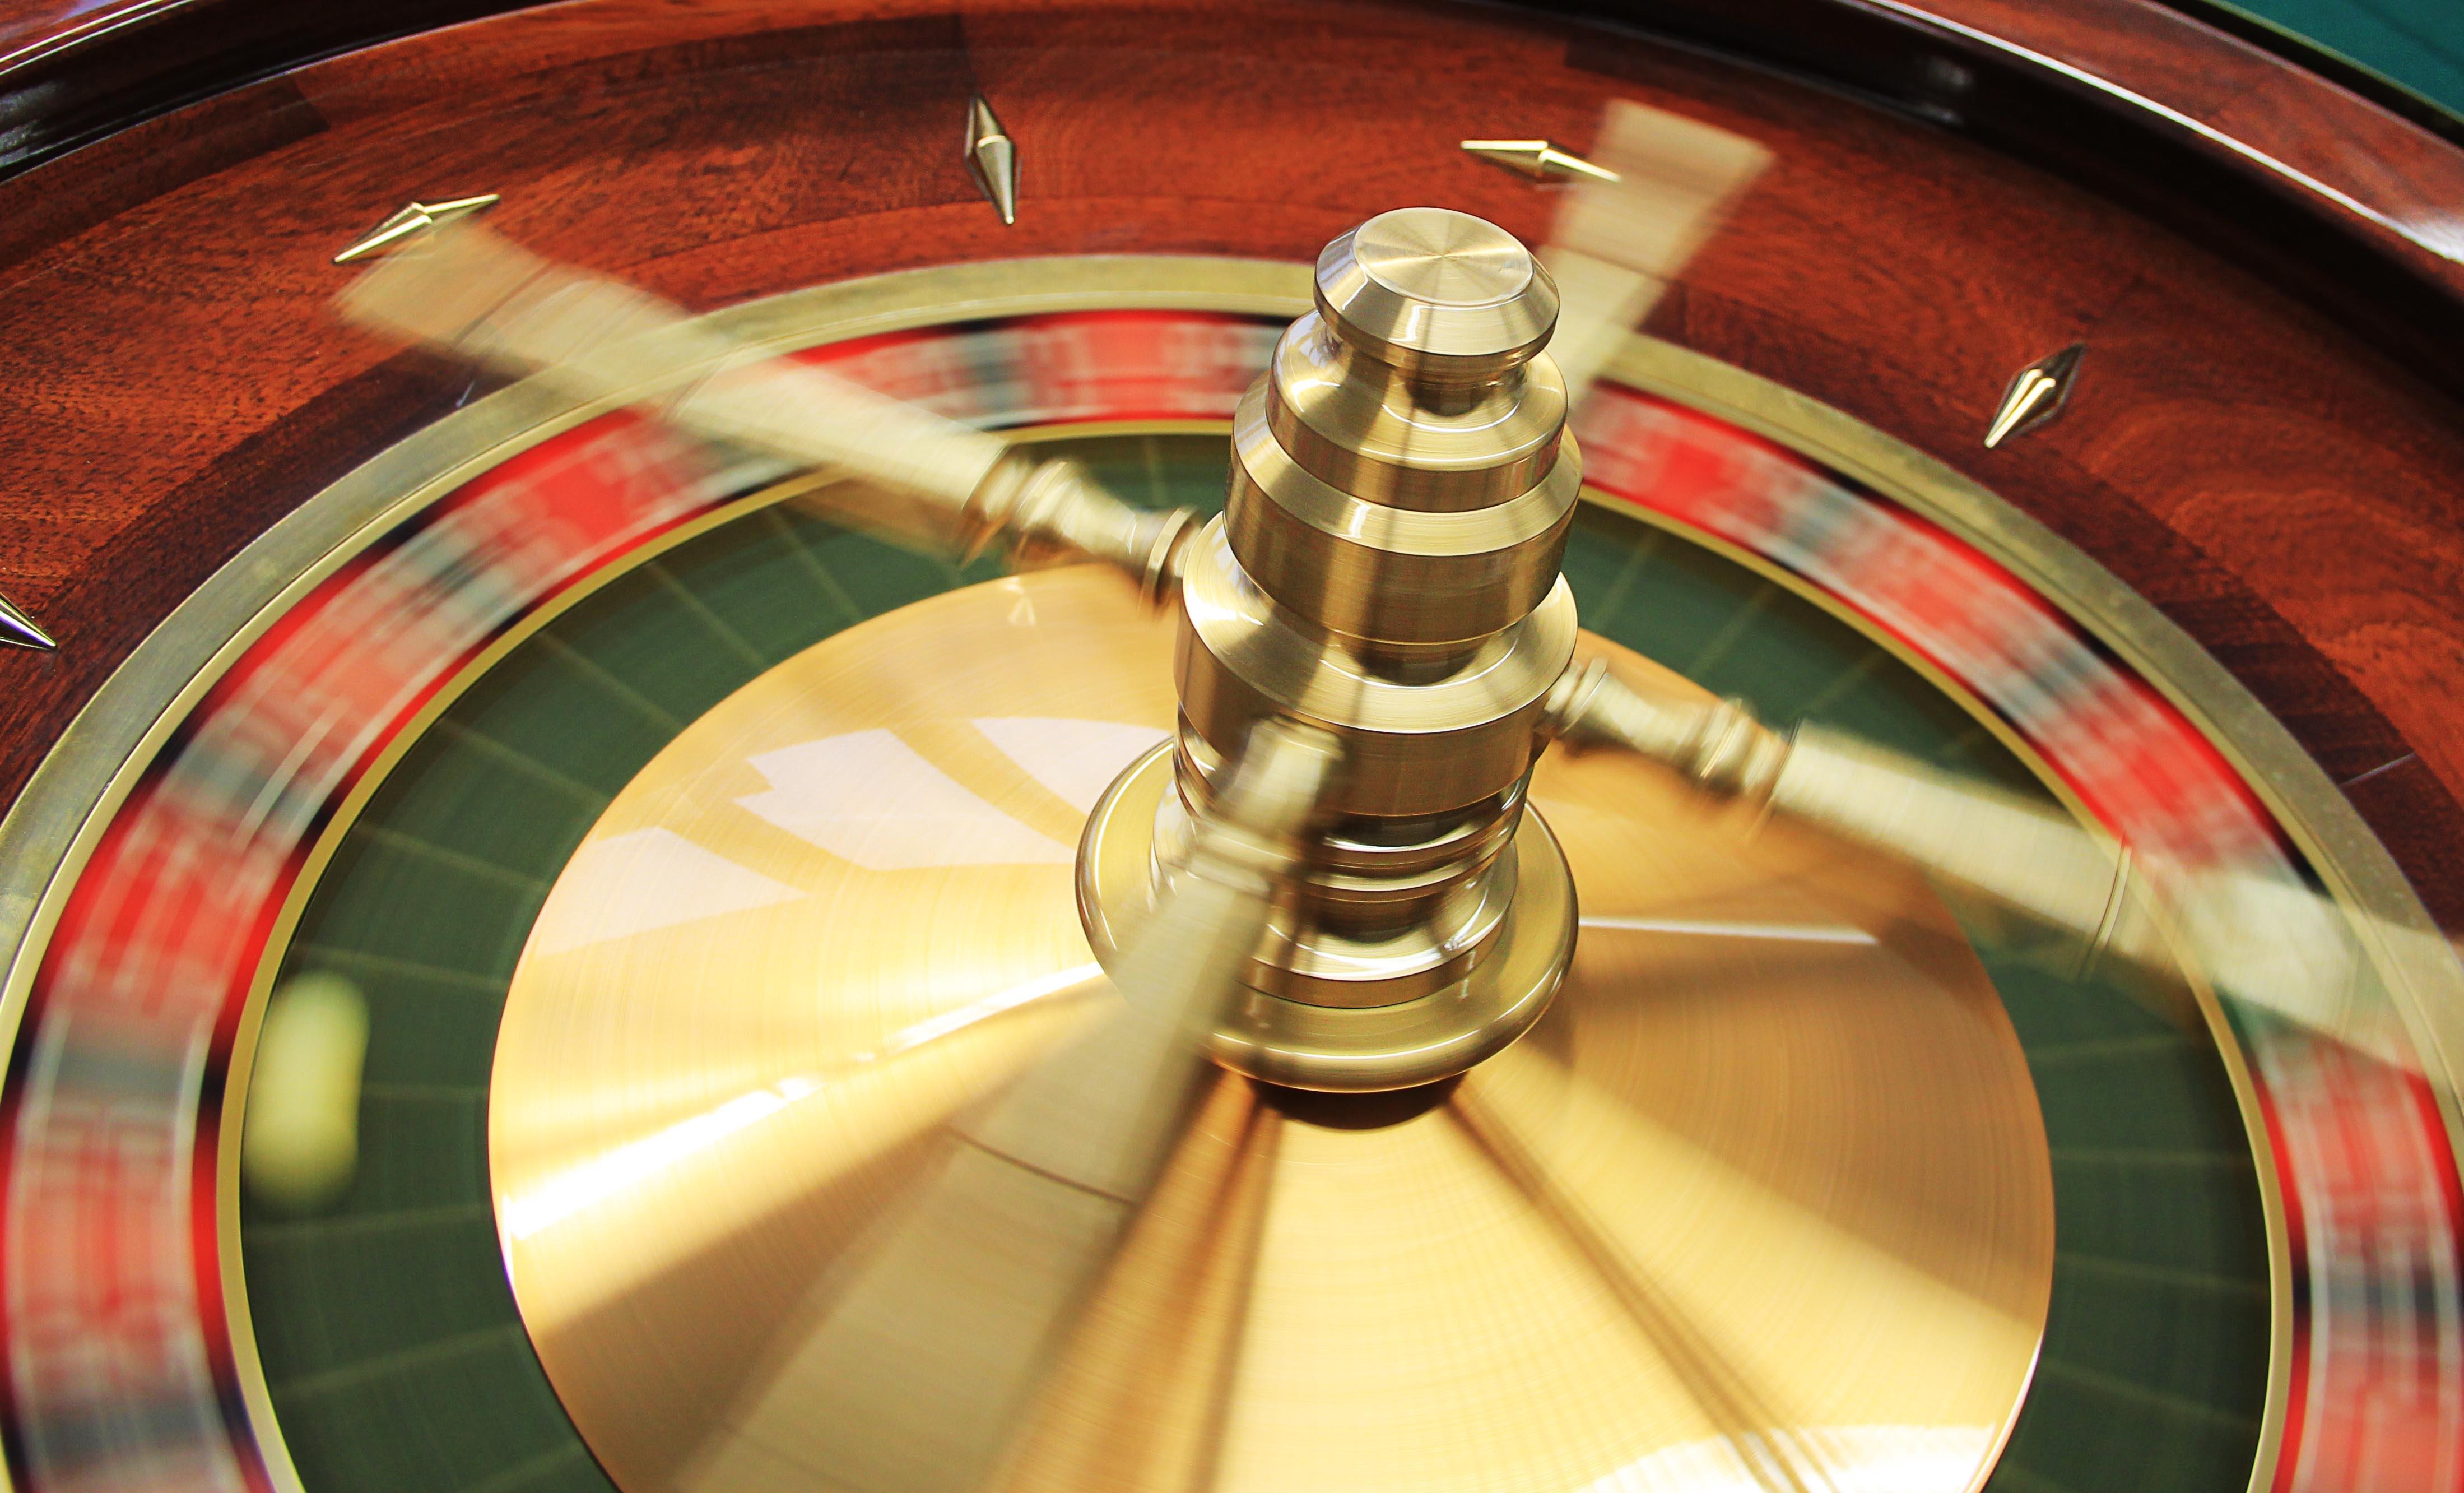 Free Images : wheel, play, color, circle, close up, gold ...